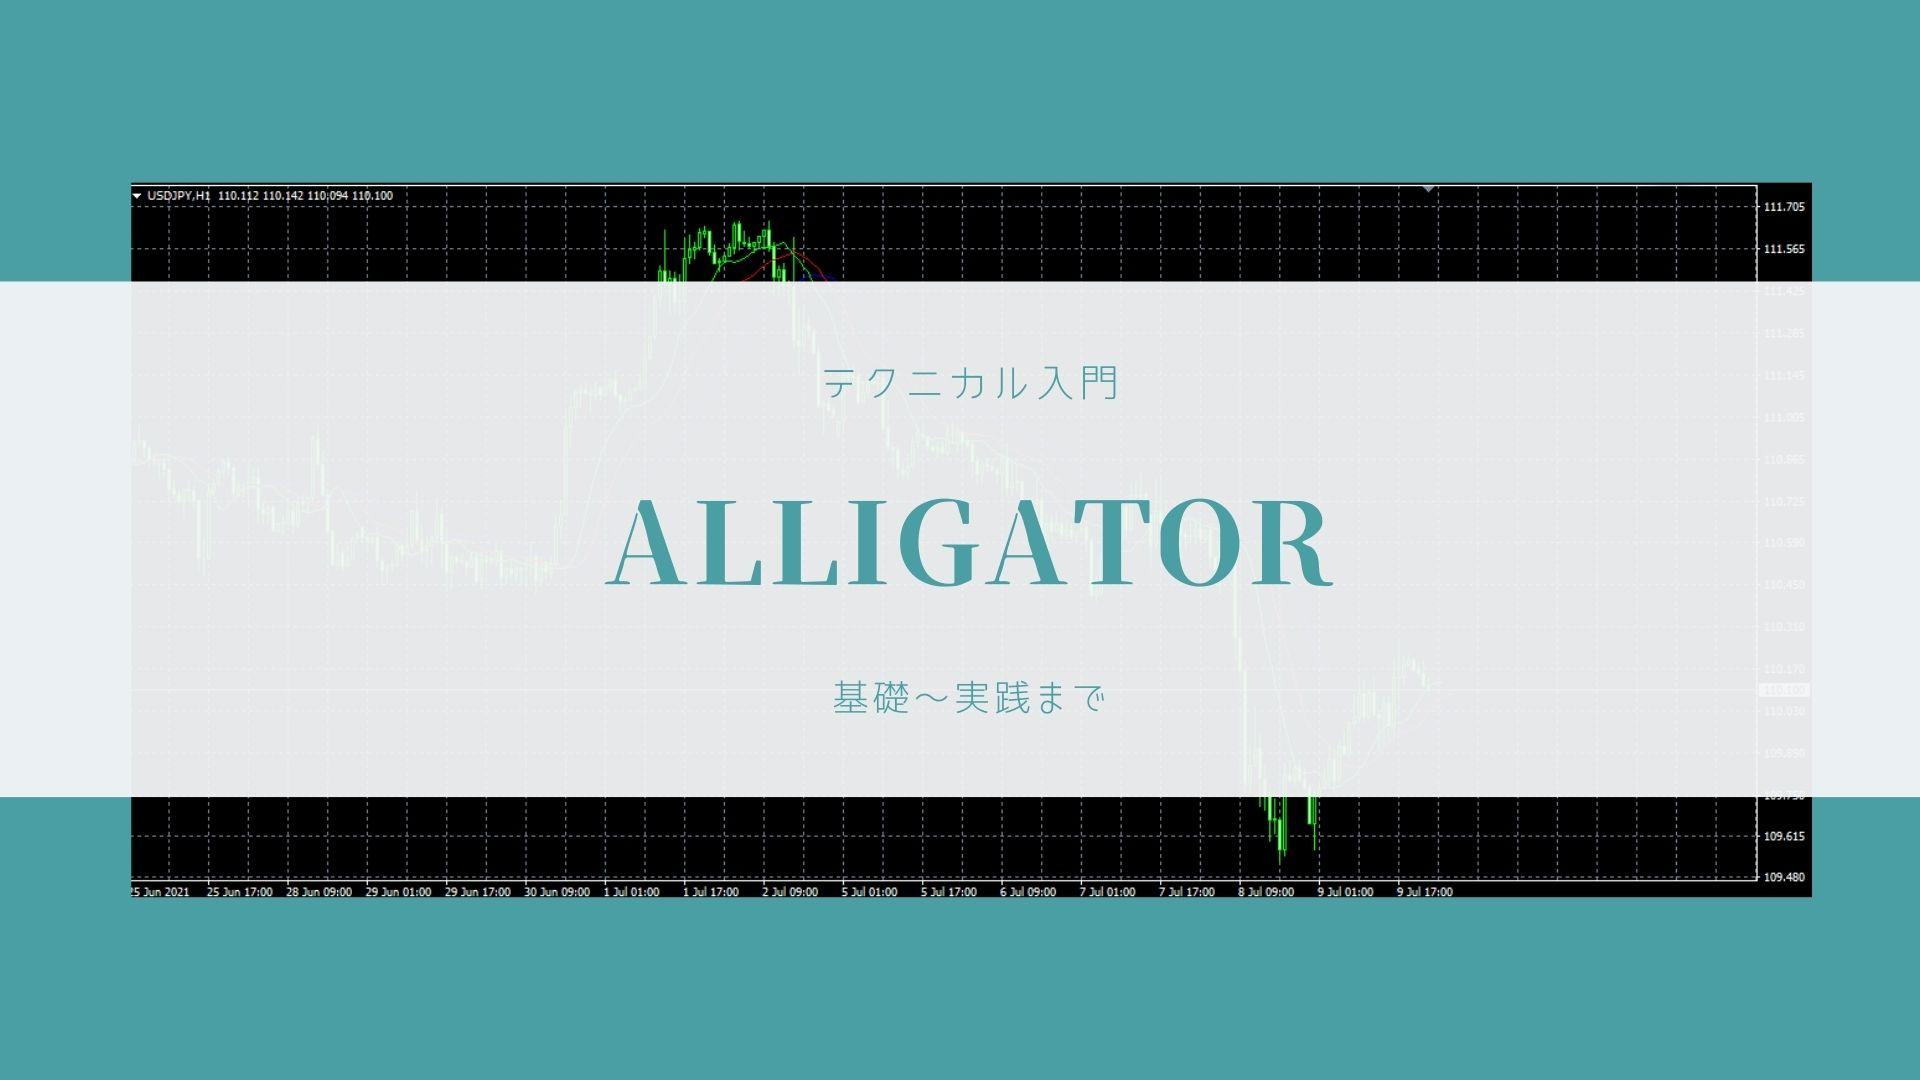 alligator-strategy-title